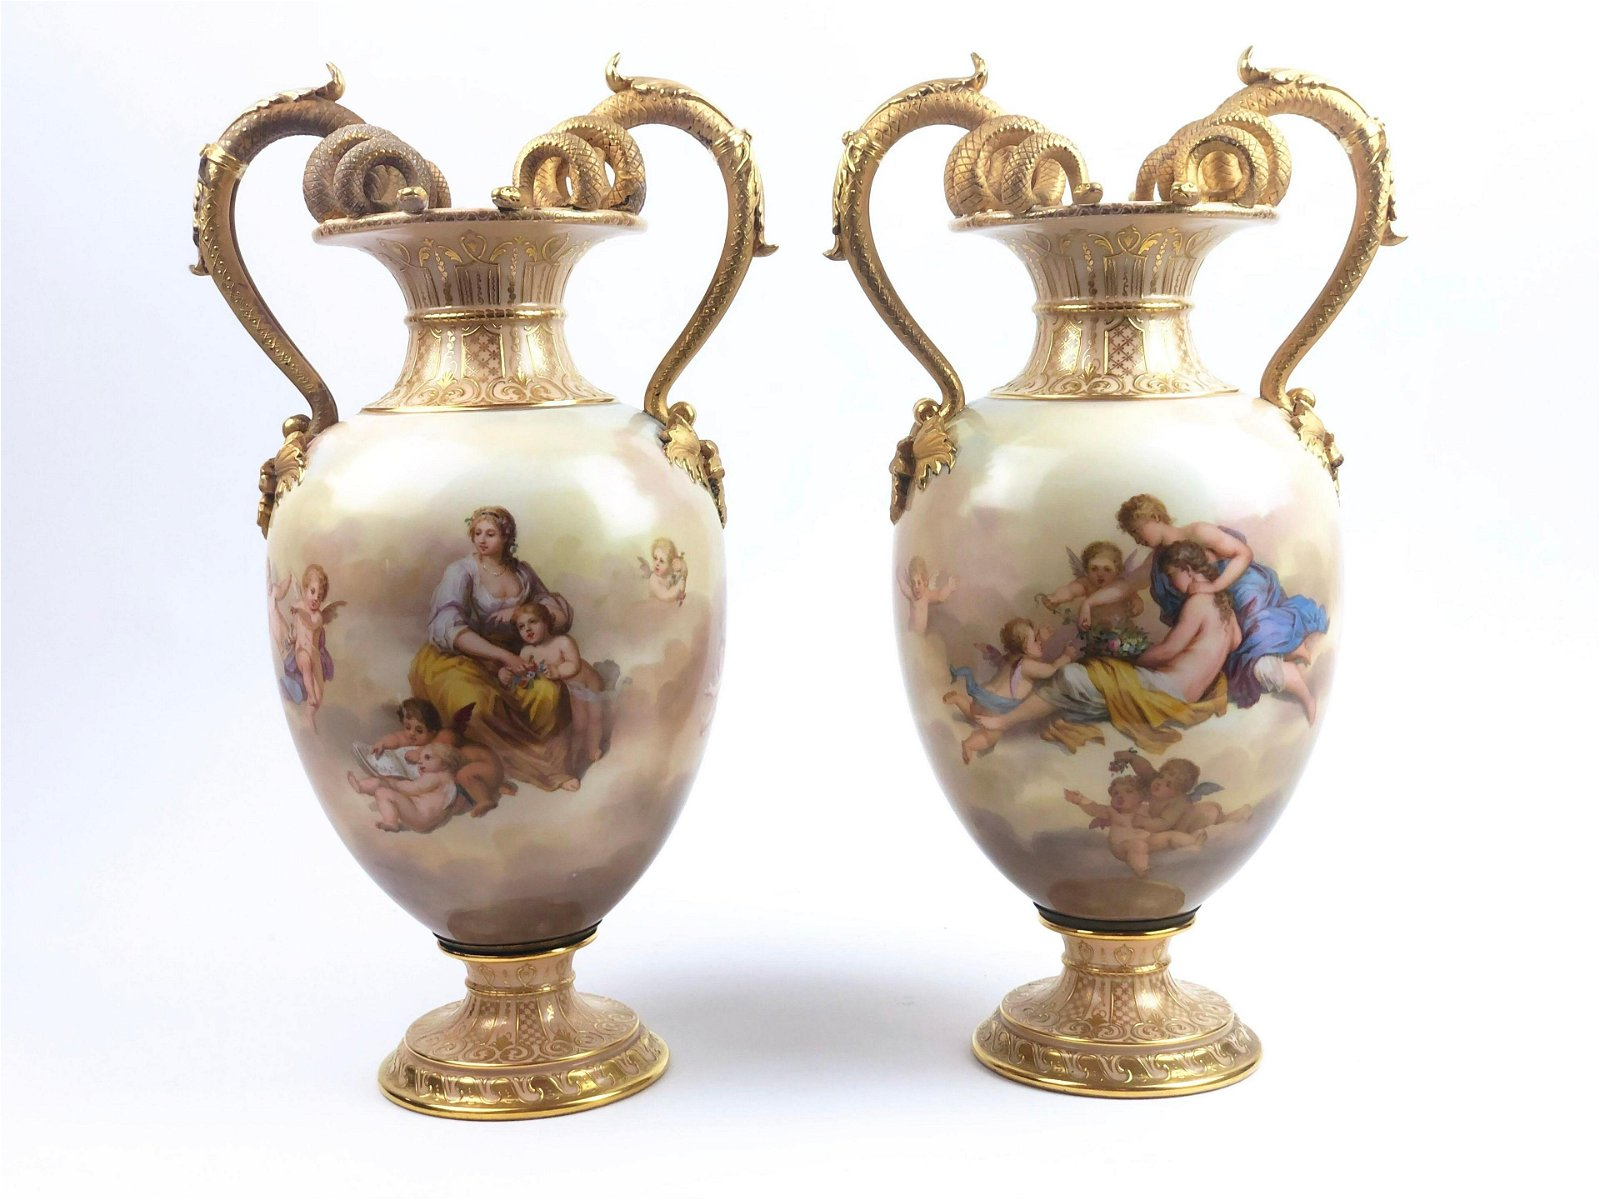 A Pair of Royal Vienna Porcelain Vases